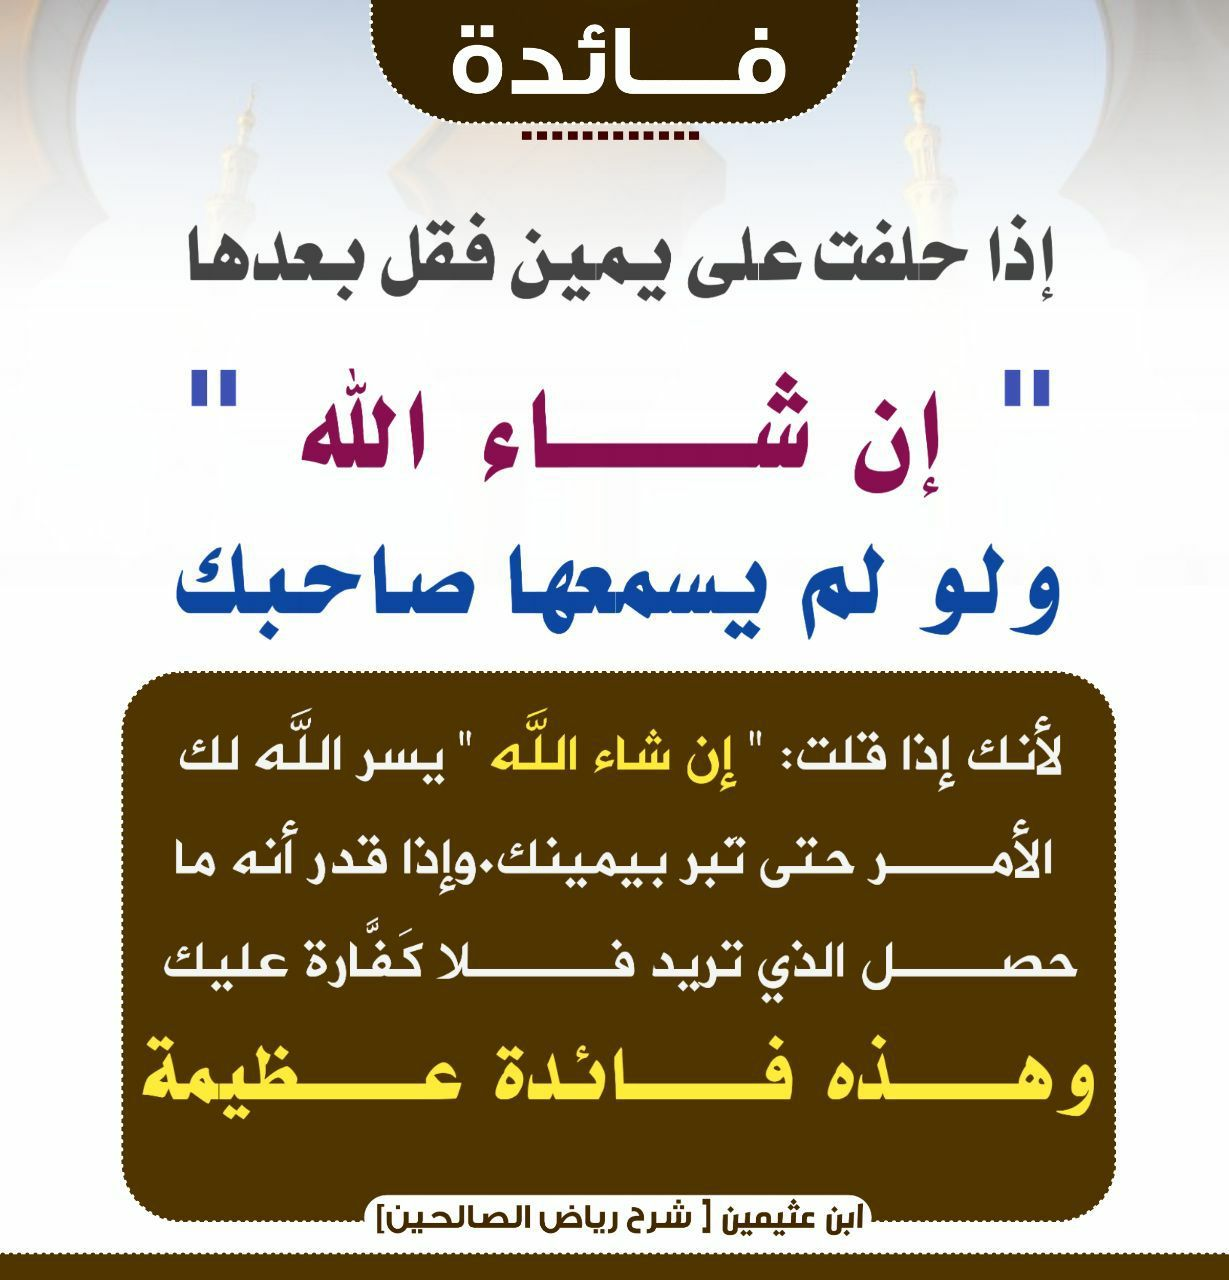 Pin By الأثر الجميل On أقوال الصحابة والعلماء Islam Beliefs Islam Beliefs